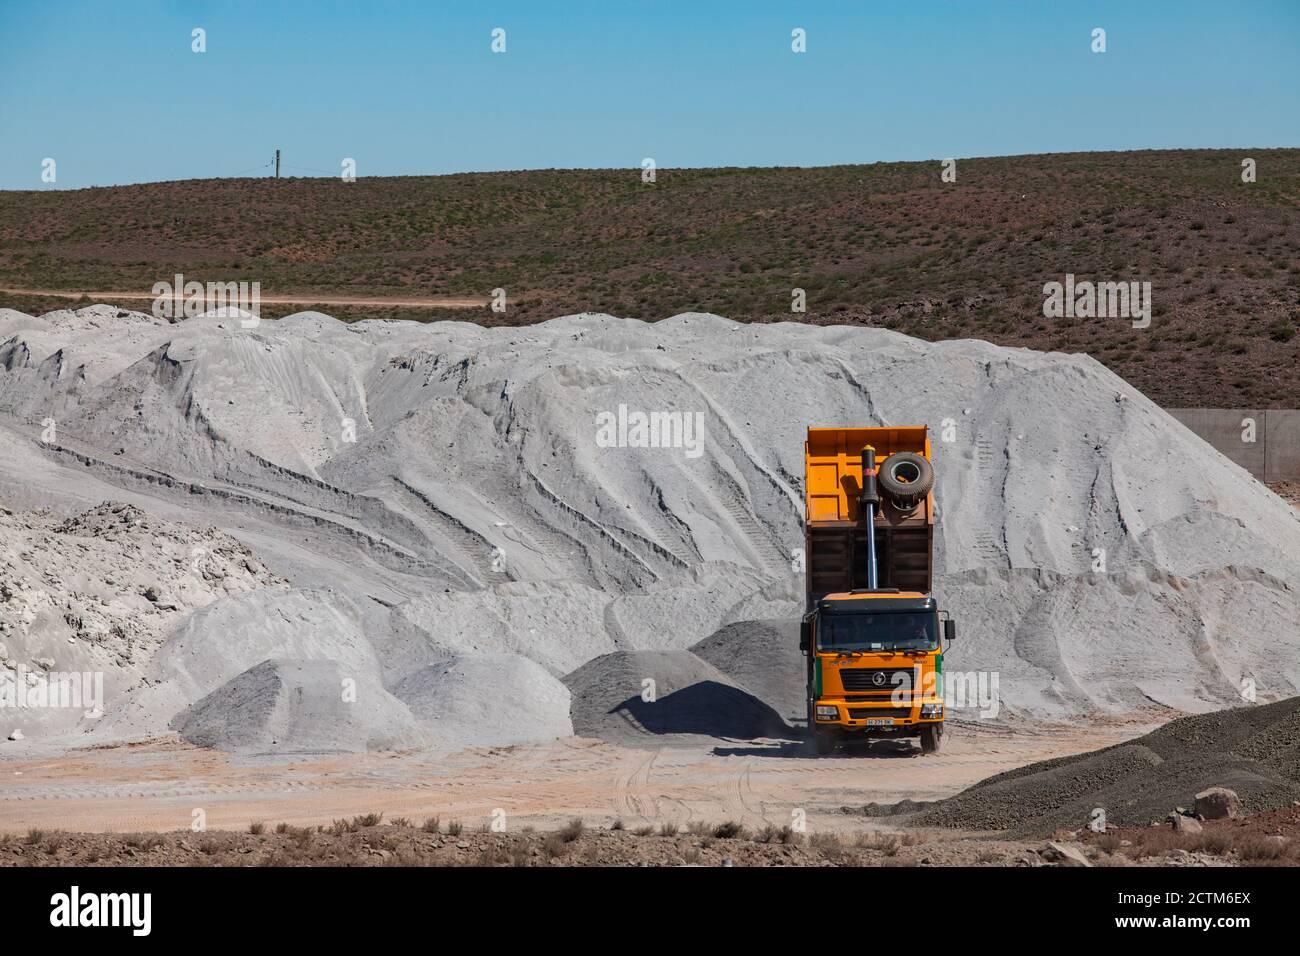 Mynaral/Kazakhstan - April 23 2012: Jambyl Cement plant storage of raw materials. Heap of clinker Minerals and yellow dump truck. Stock Photo